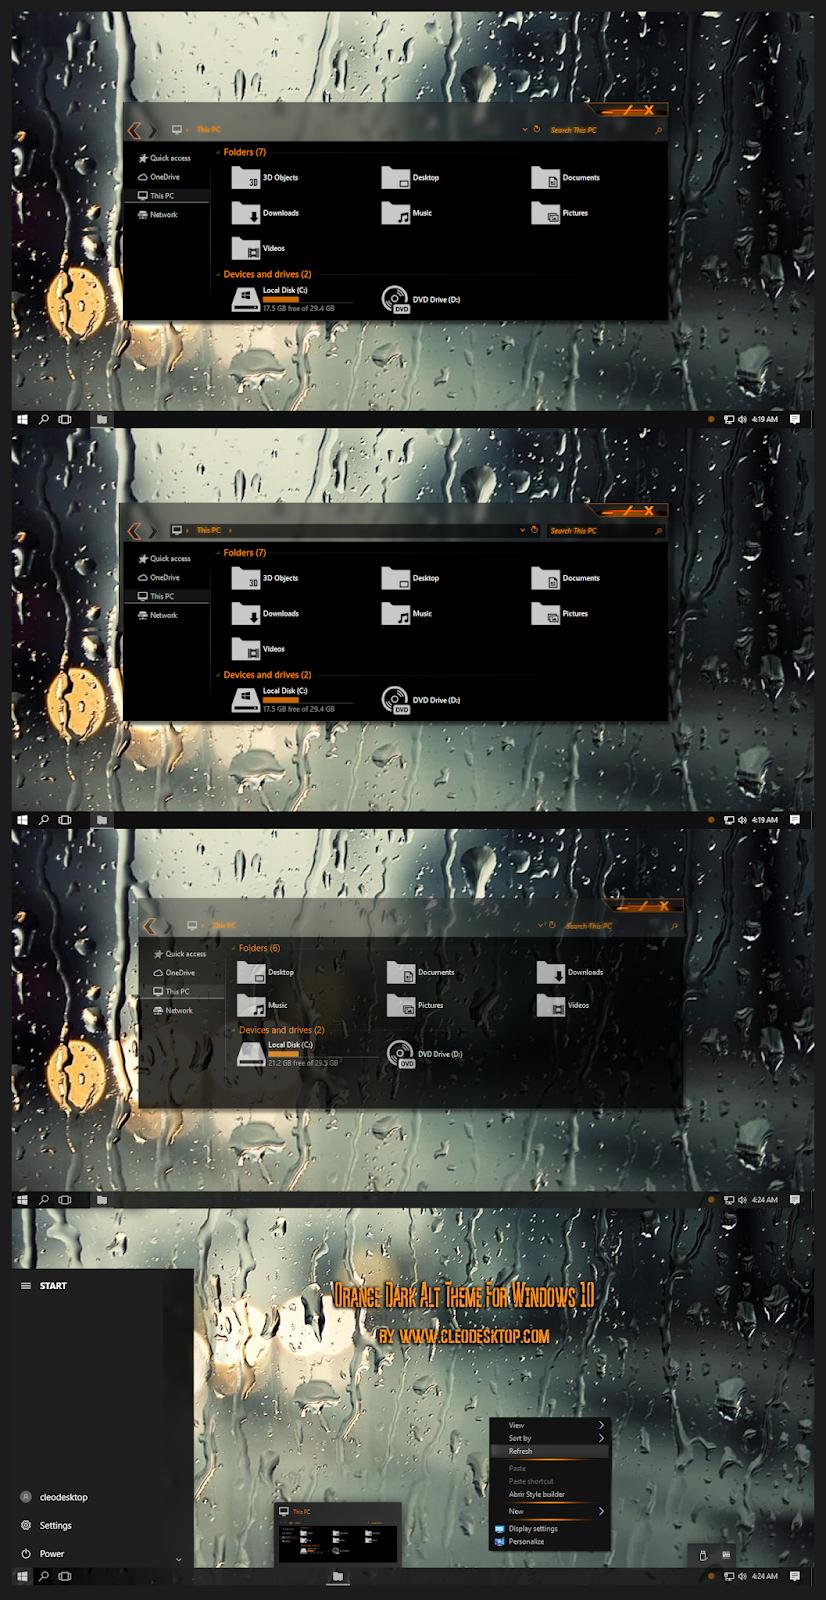 Orange Dark Alt Aero Theme Windows10 November 2019 Update 1909